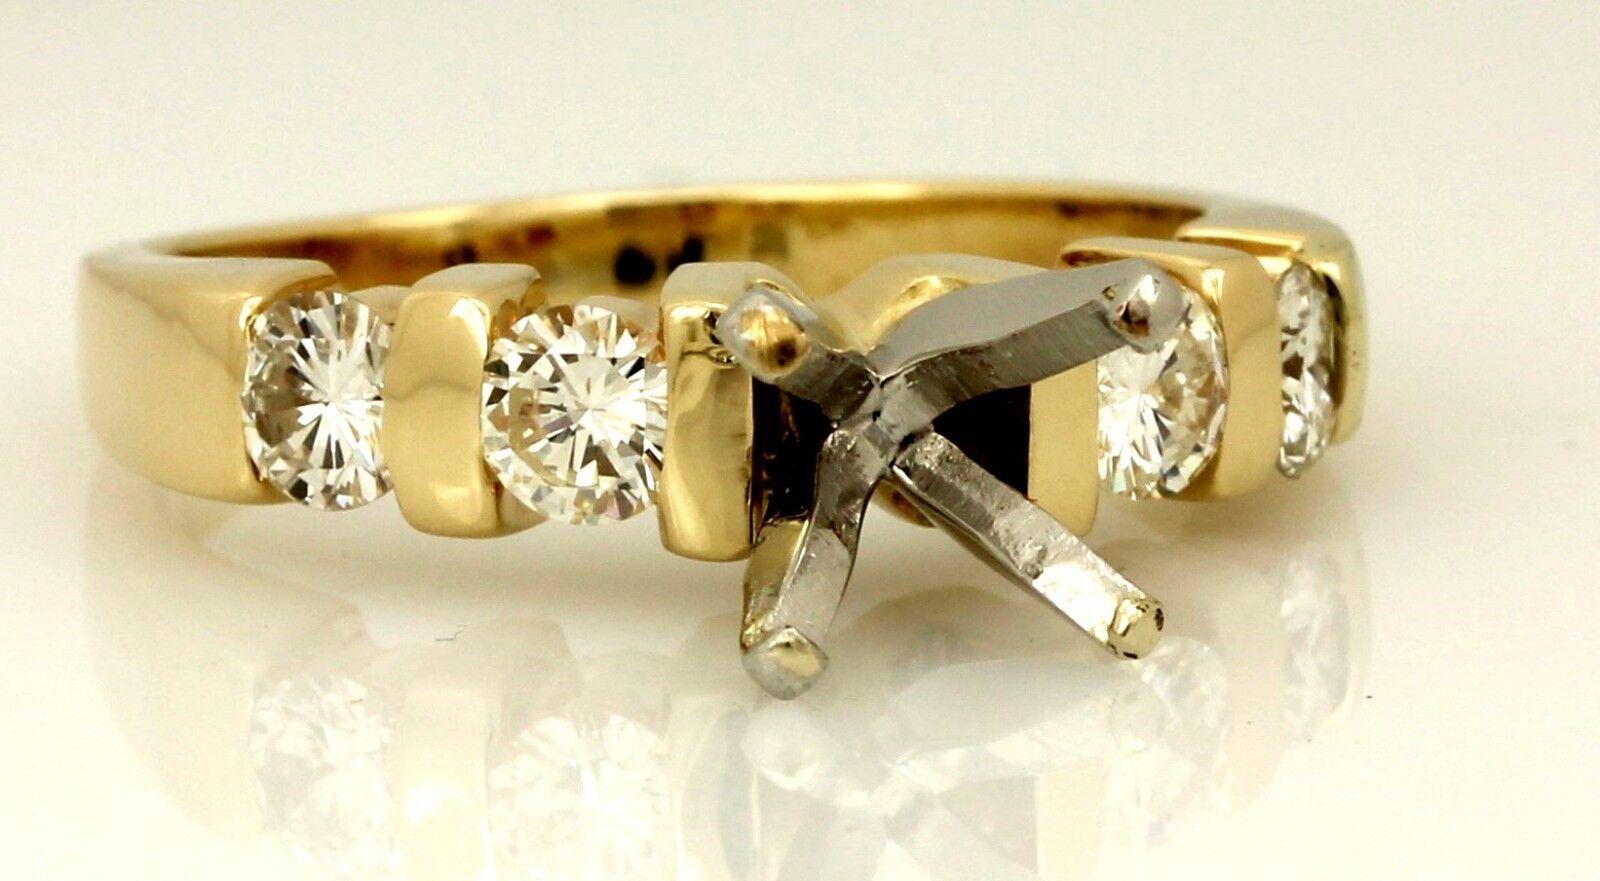 14k yellow gold engagement ring semimount 0.62ctw round diamond 6.5mm M&M estate